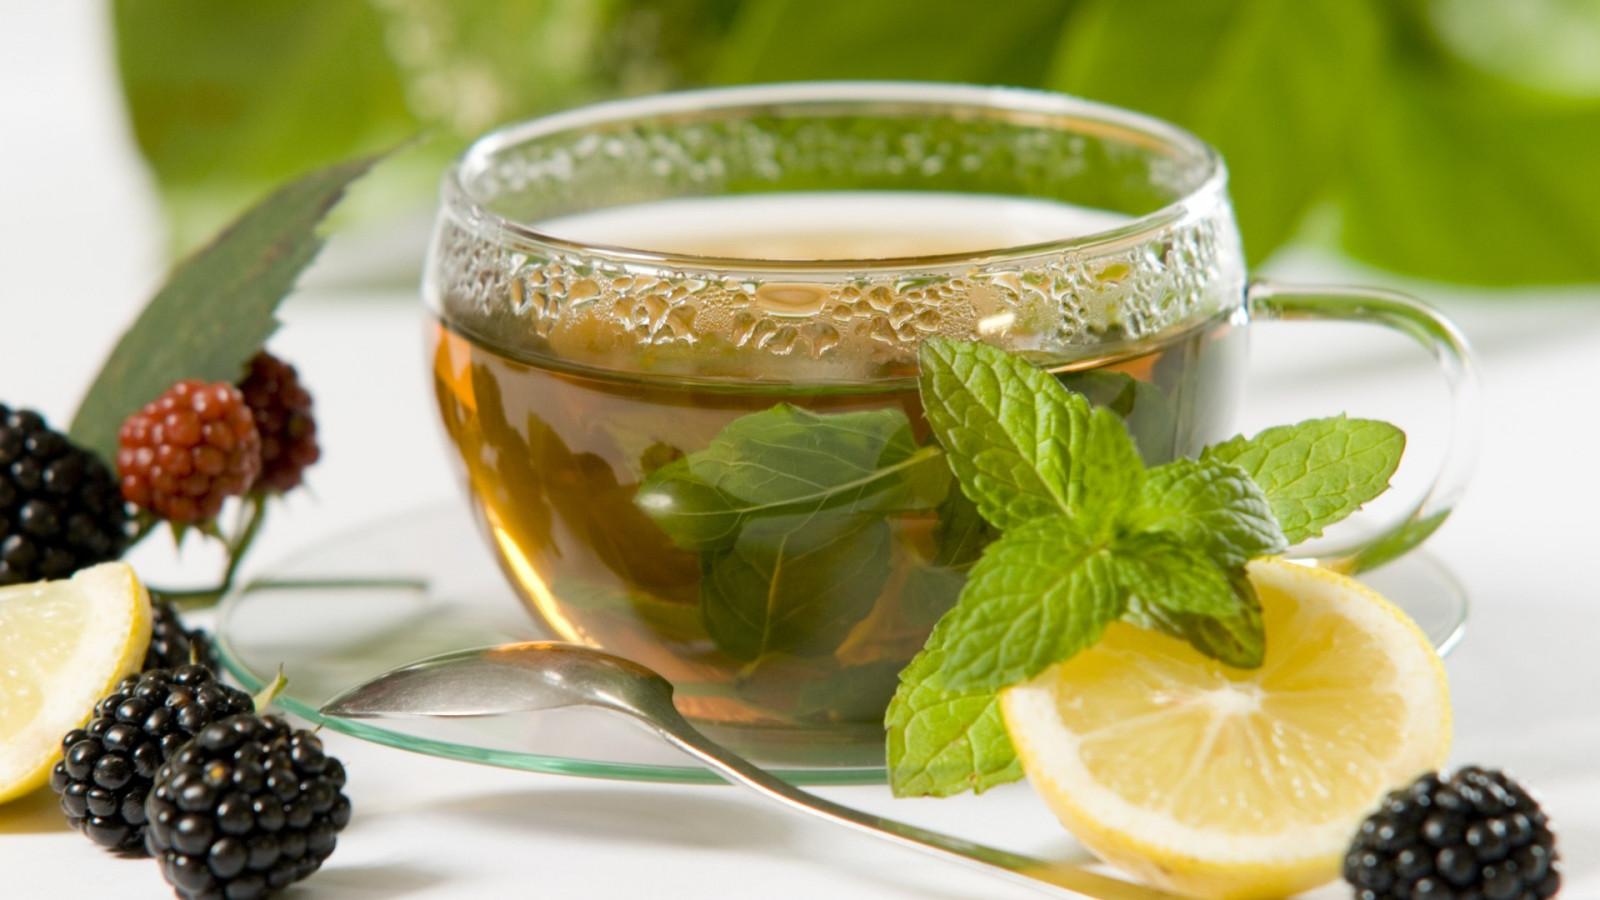 tea, spoon, cup, lemon, blackberry